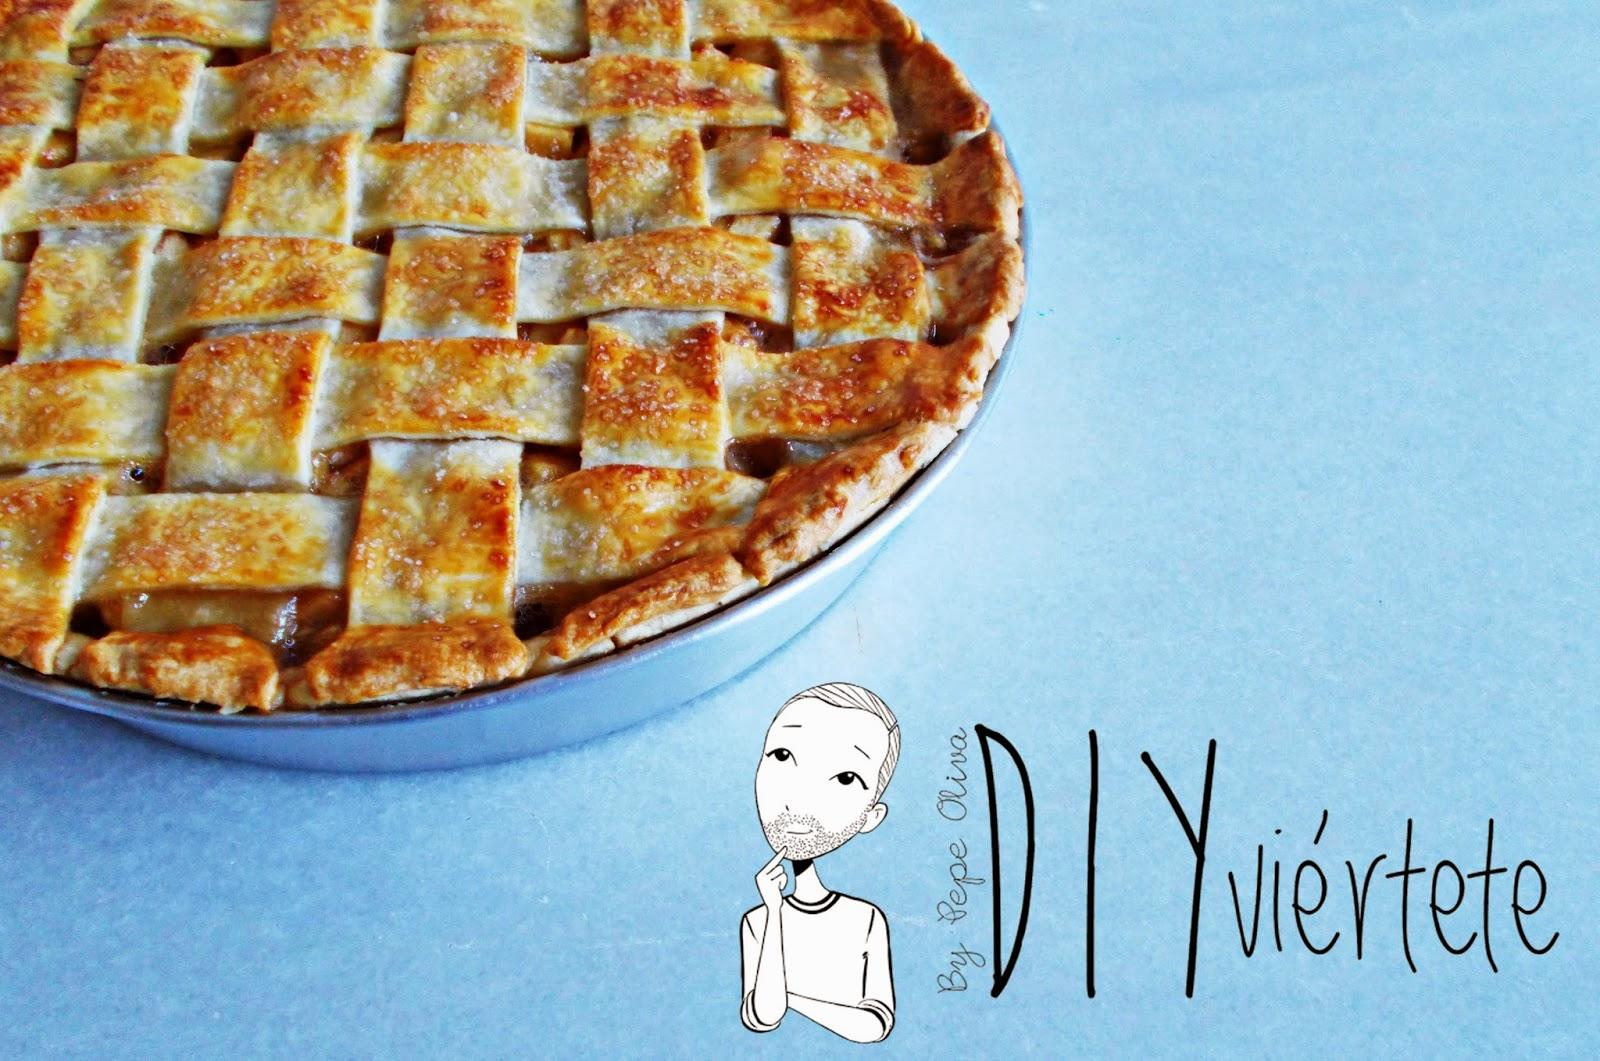 Receta-cocina-postre-reposteria-tarta de manzana-apple pie-pie de manzana-canela-fruta-1